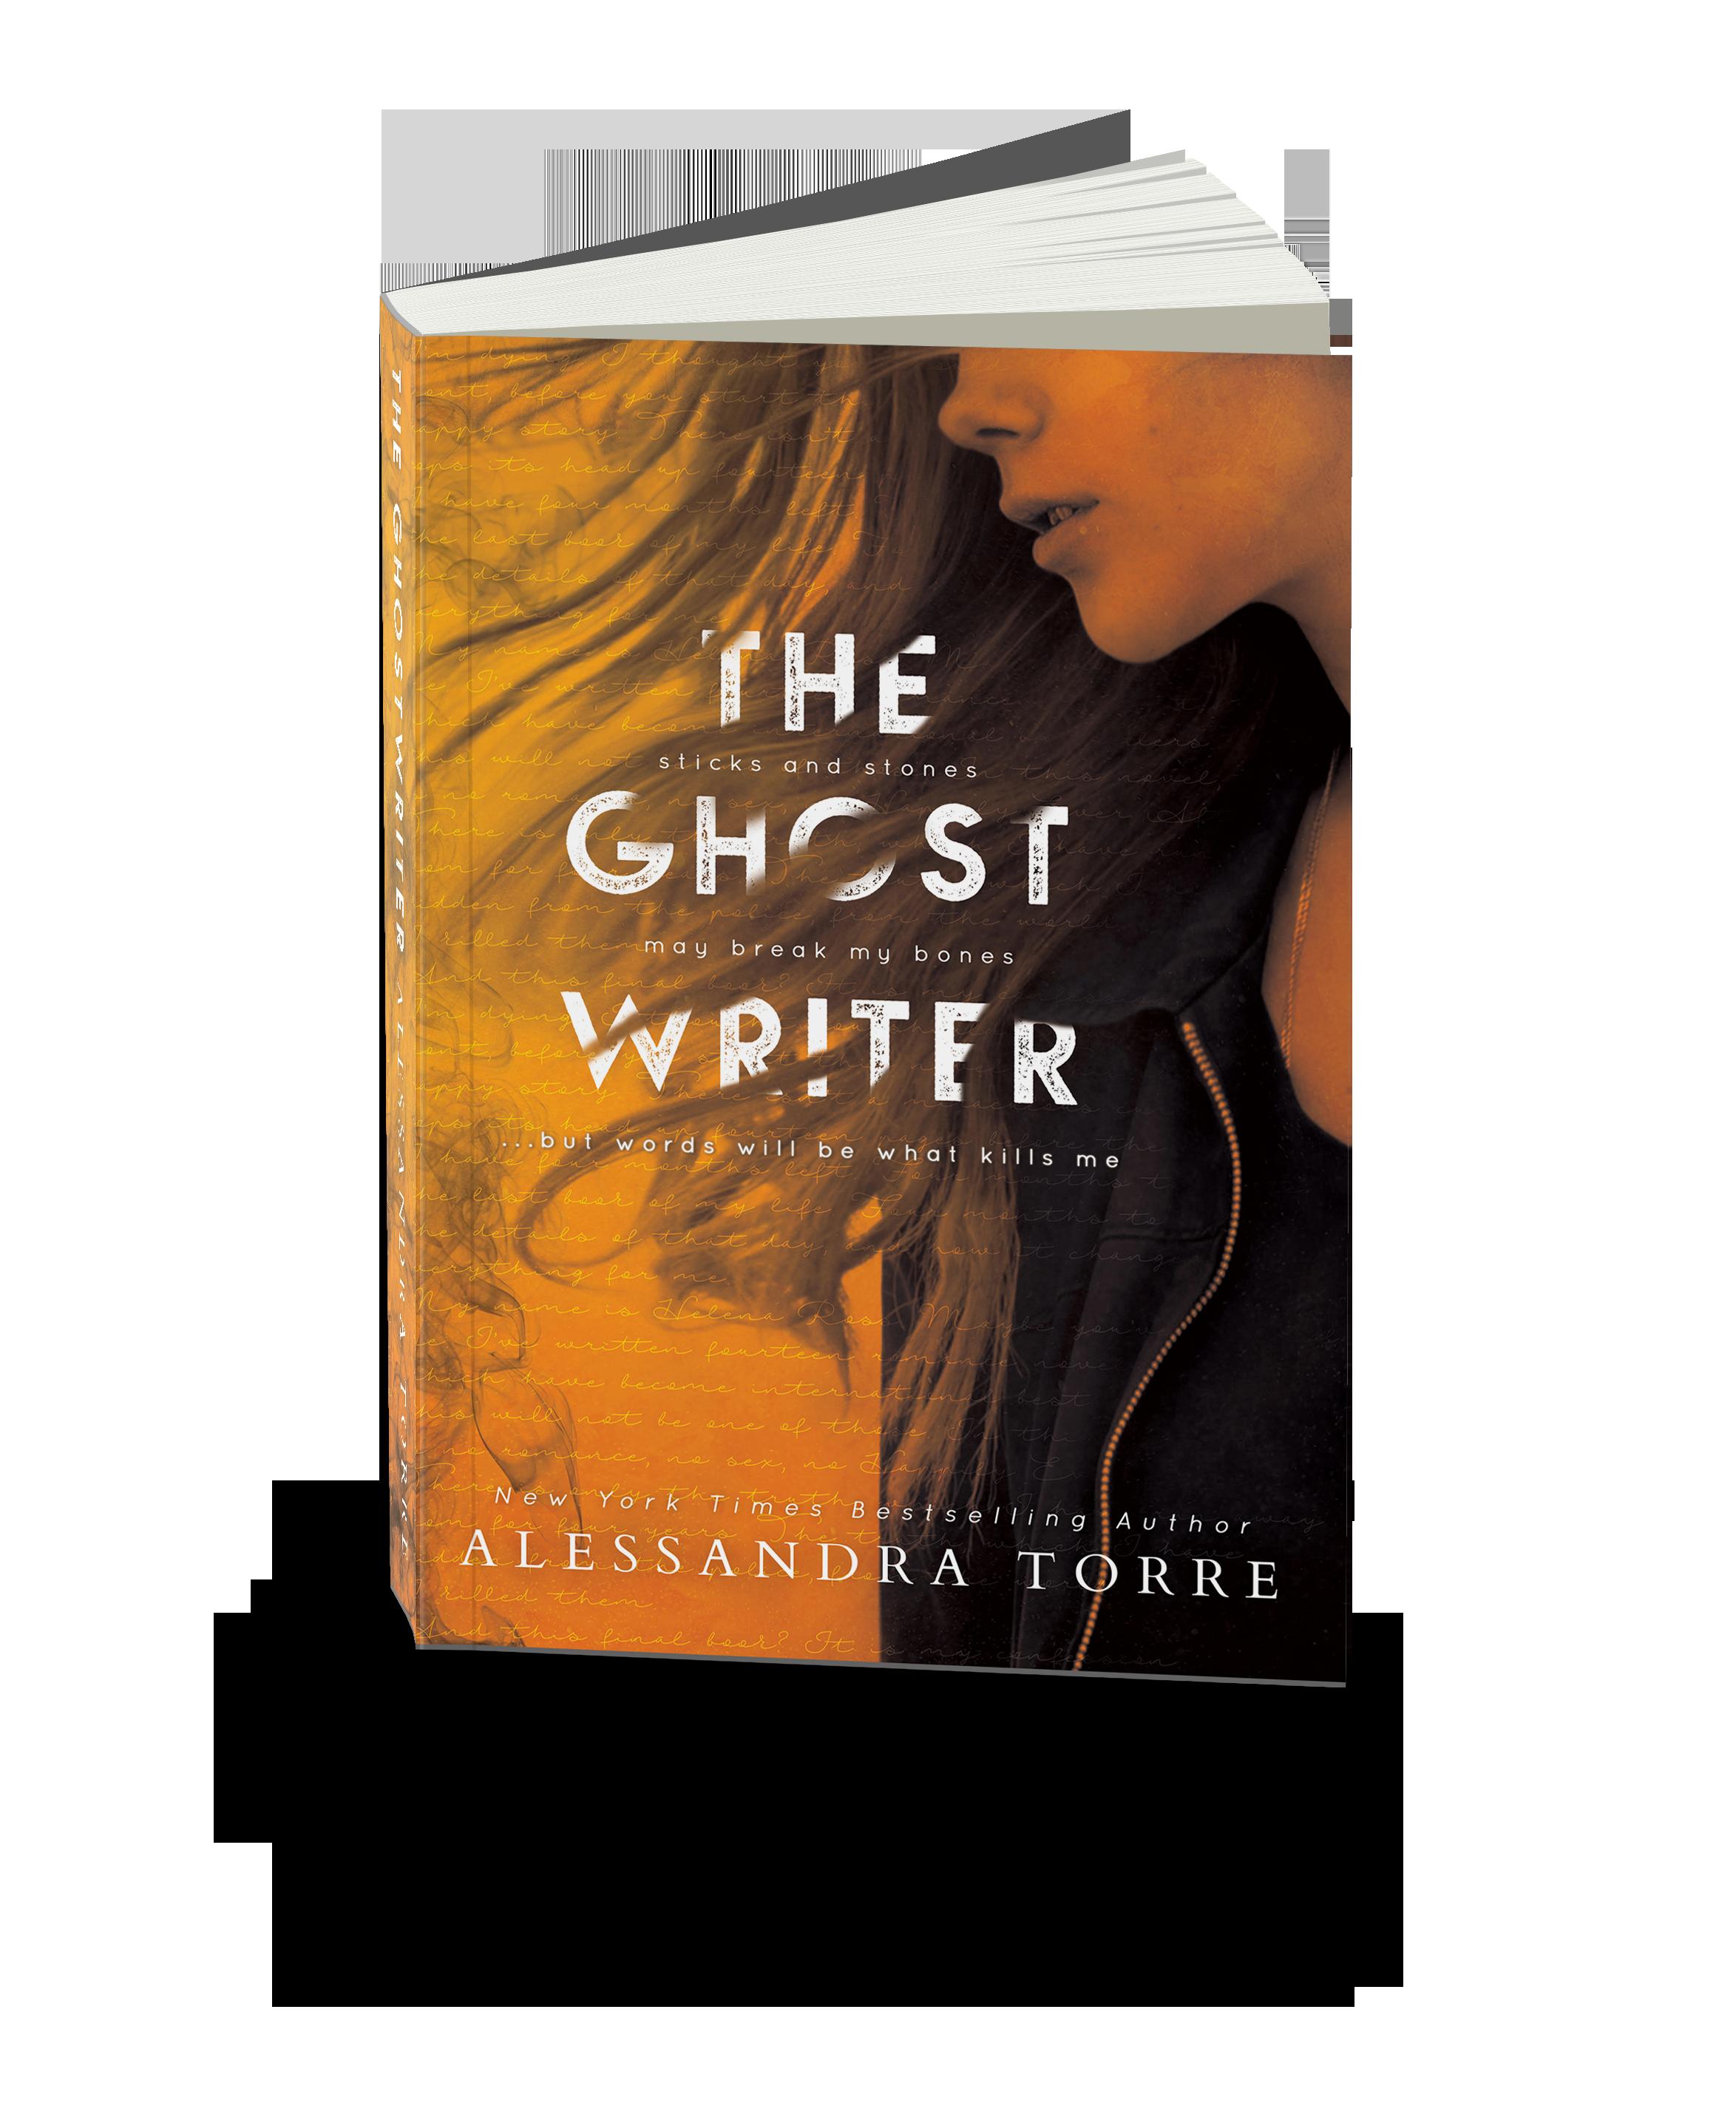 The Ghostwriter-website-1.png